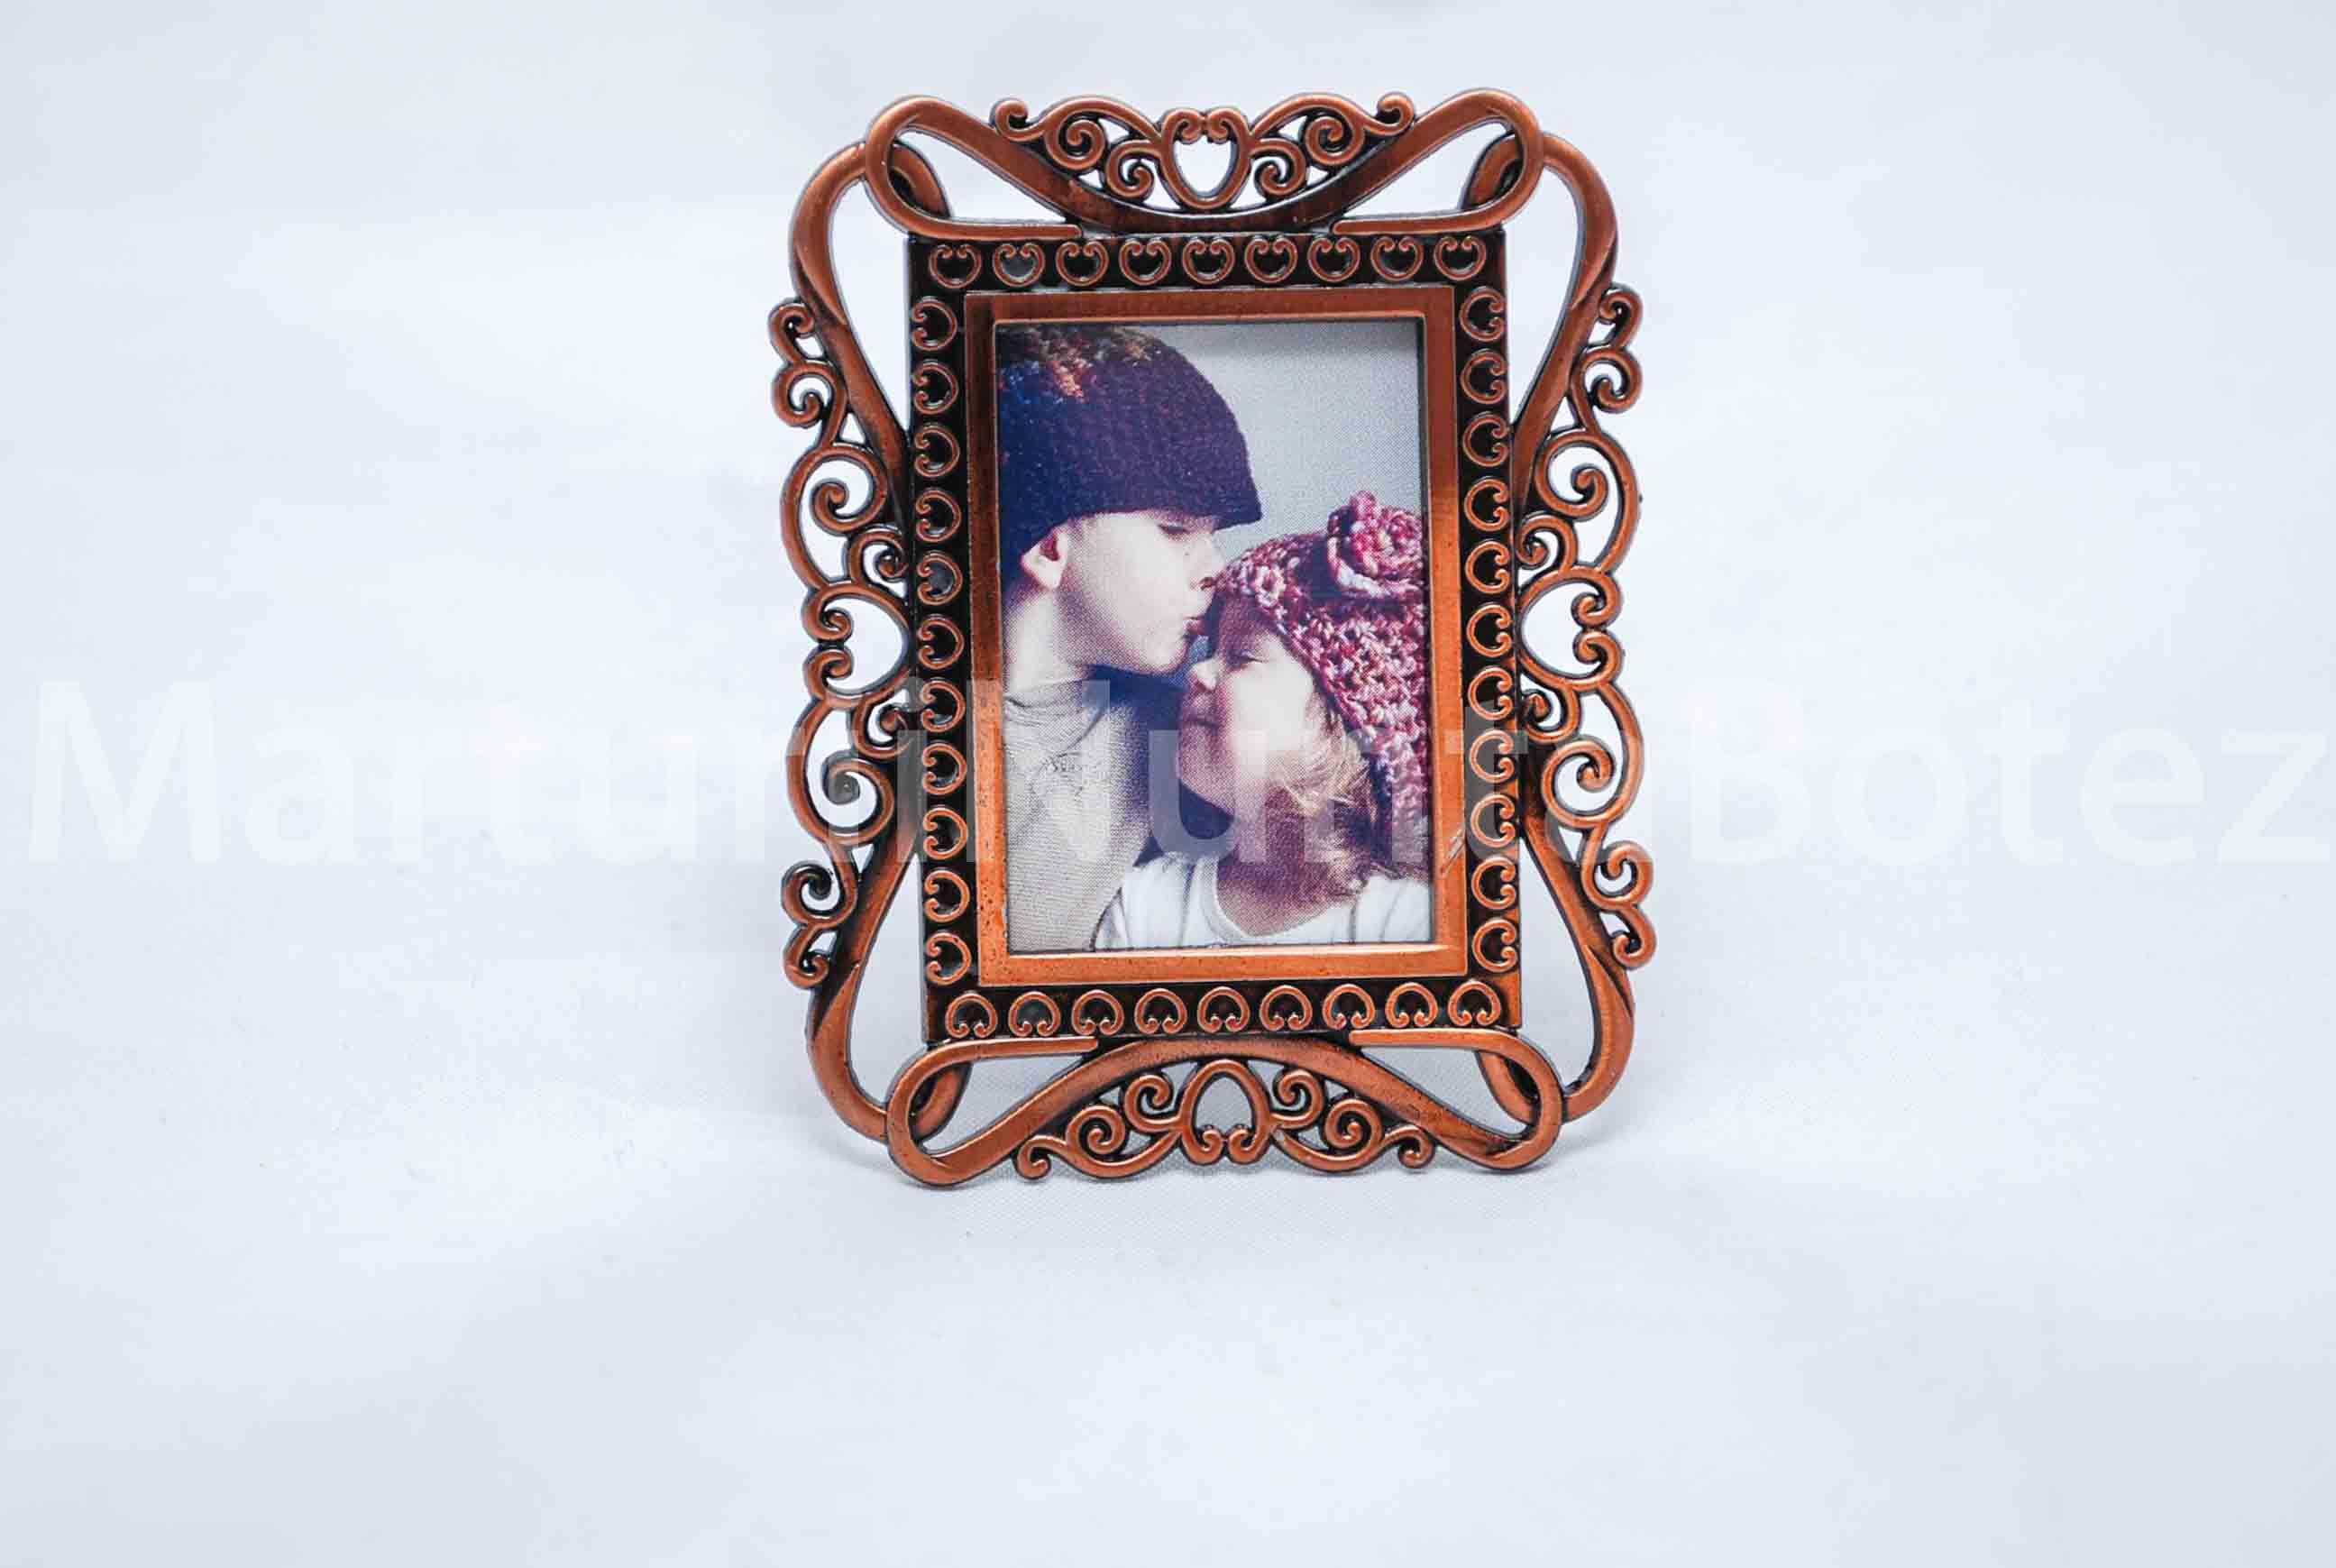 marturii_nunta_botez_rama_foto_metalica_dreptunghiulara_inima2